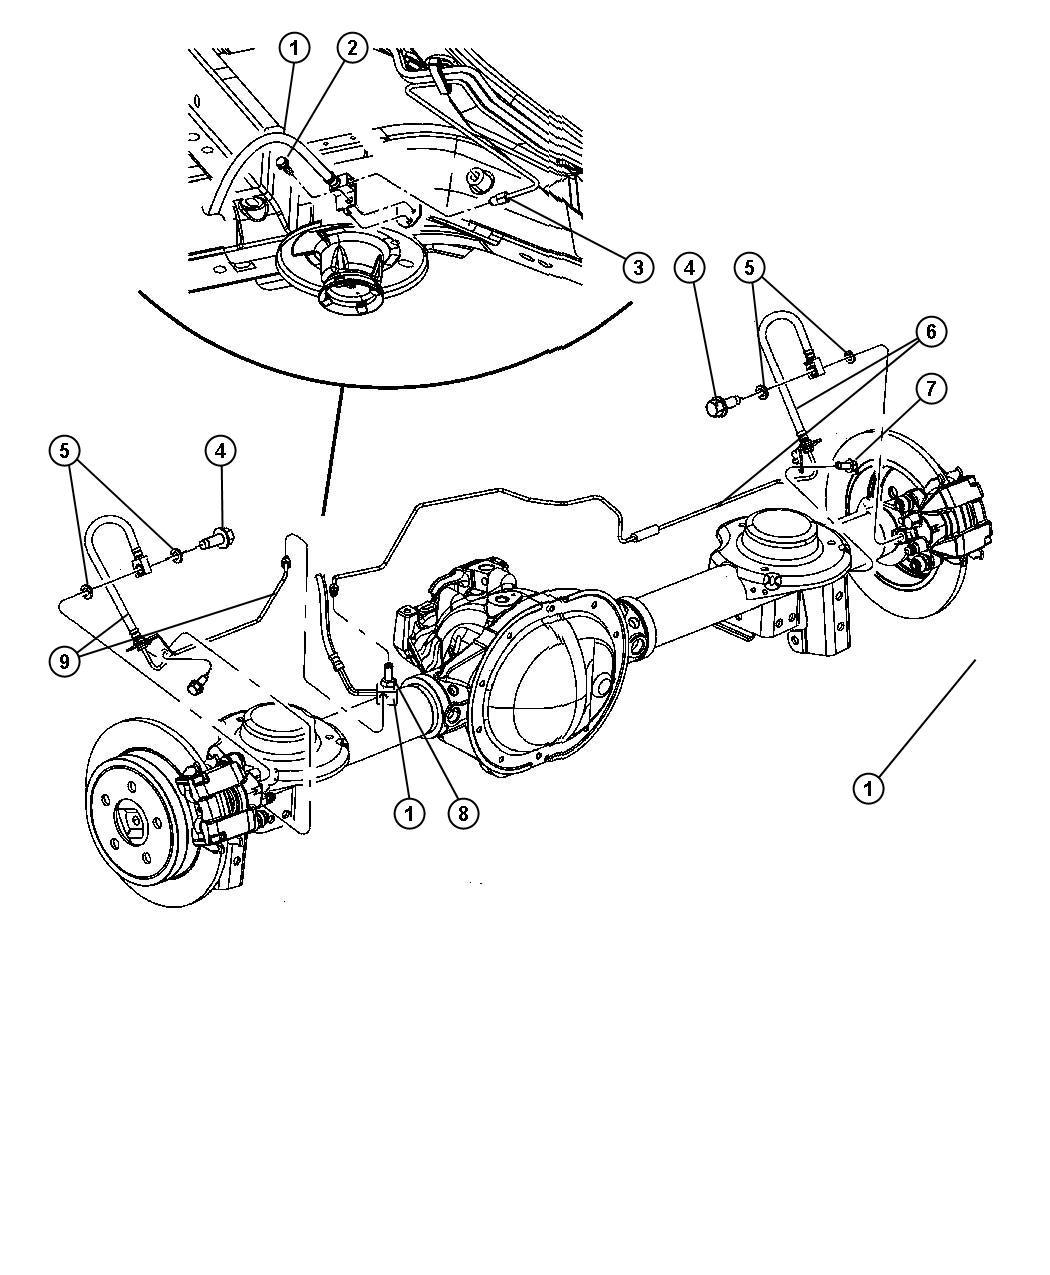 [DIAGRAM] 2004 Jeep Liberty Diagram FULL Version HD